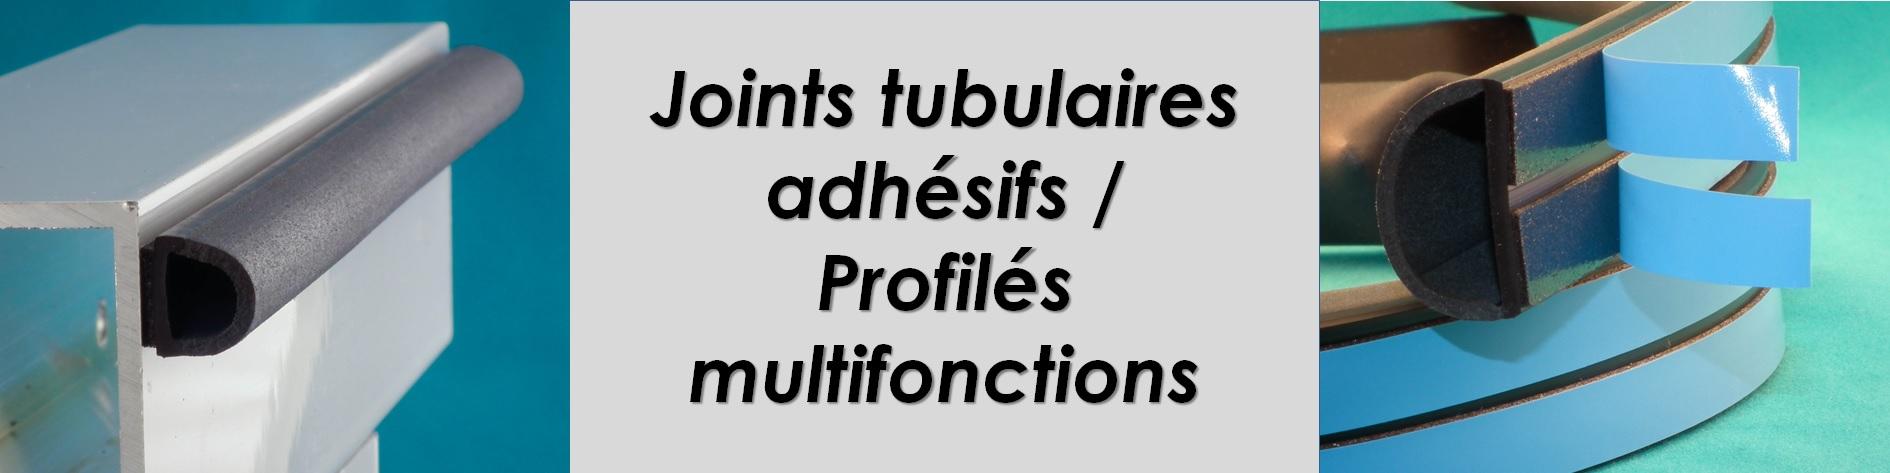 joint tubulaire Adhésif